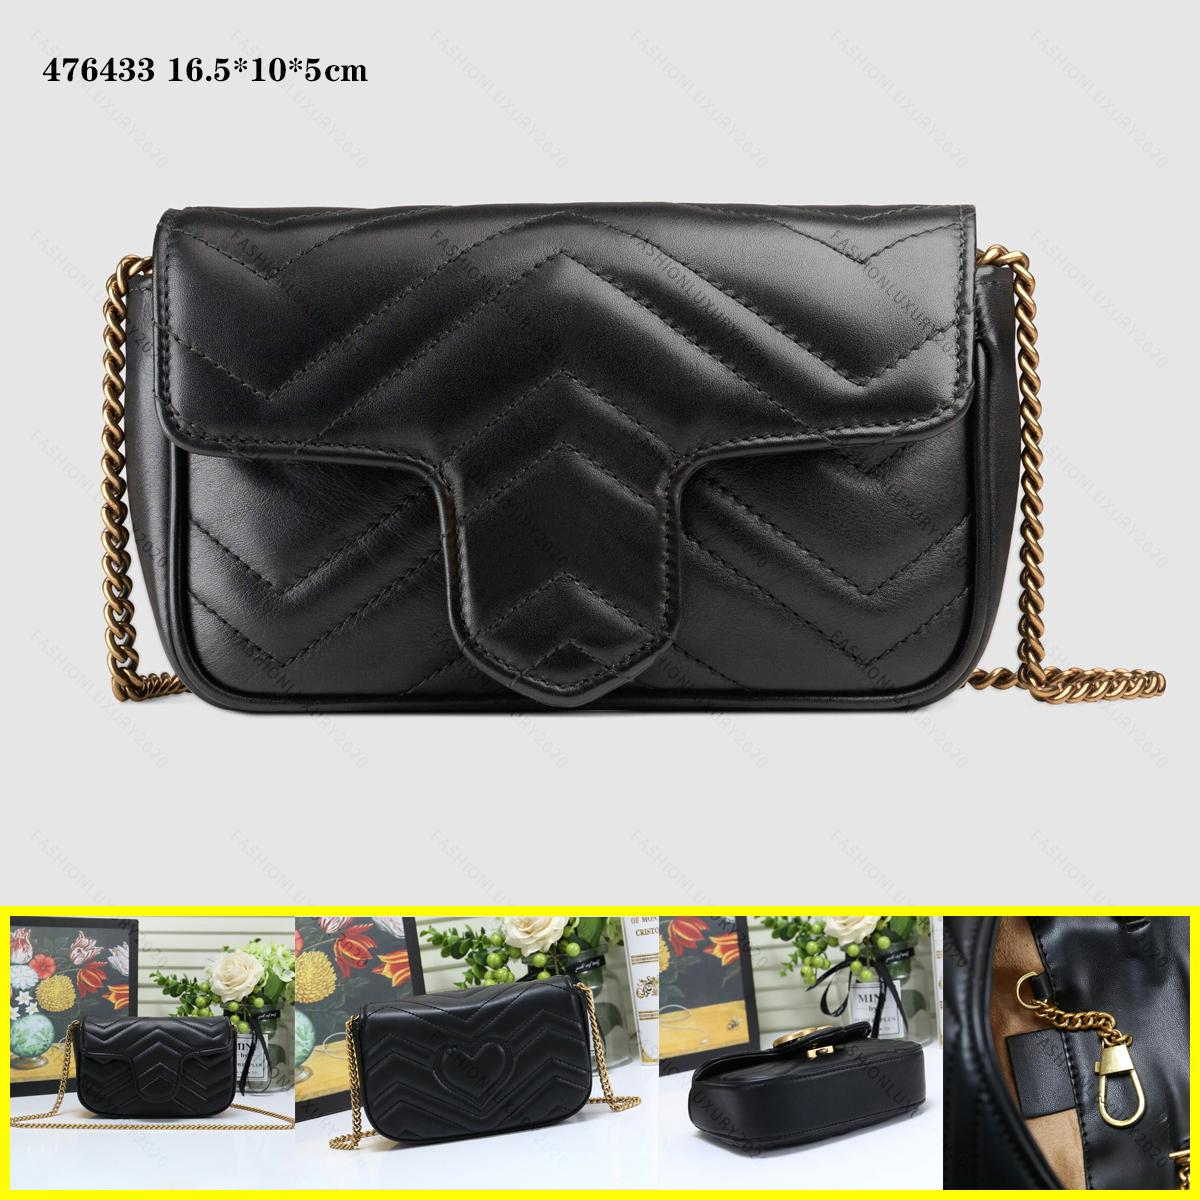 Echtes Leder Frauen Marmont Messenger Bags Geldbörse Goldkette Umhängetaschen Kreuz Körper Damen Mode Mini Bag Brieftasche 4 Farben 16,5 cm